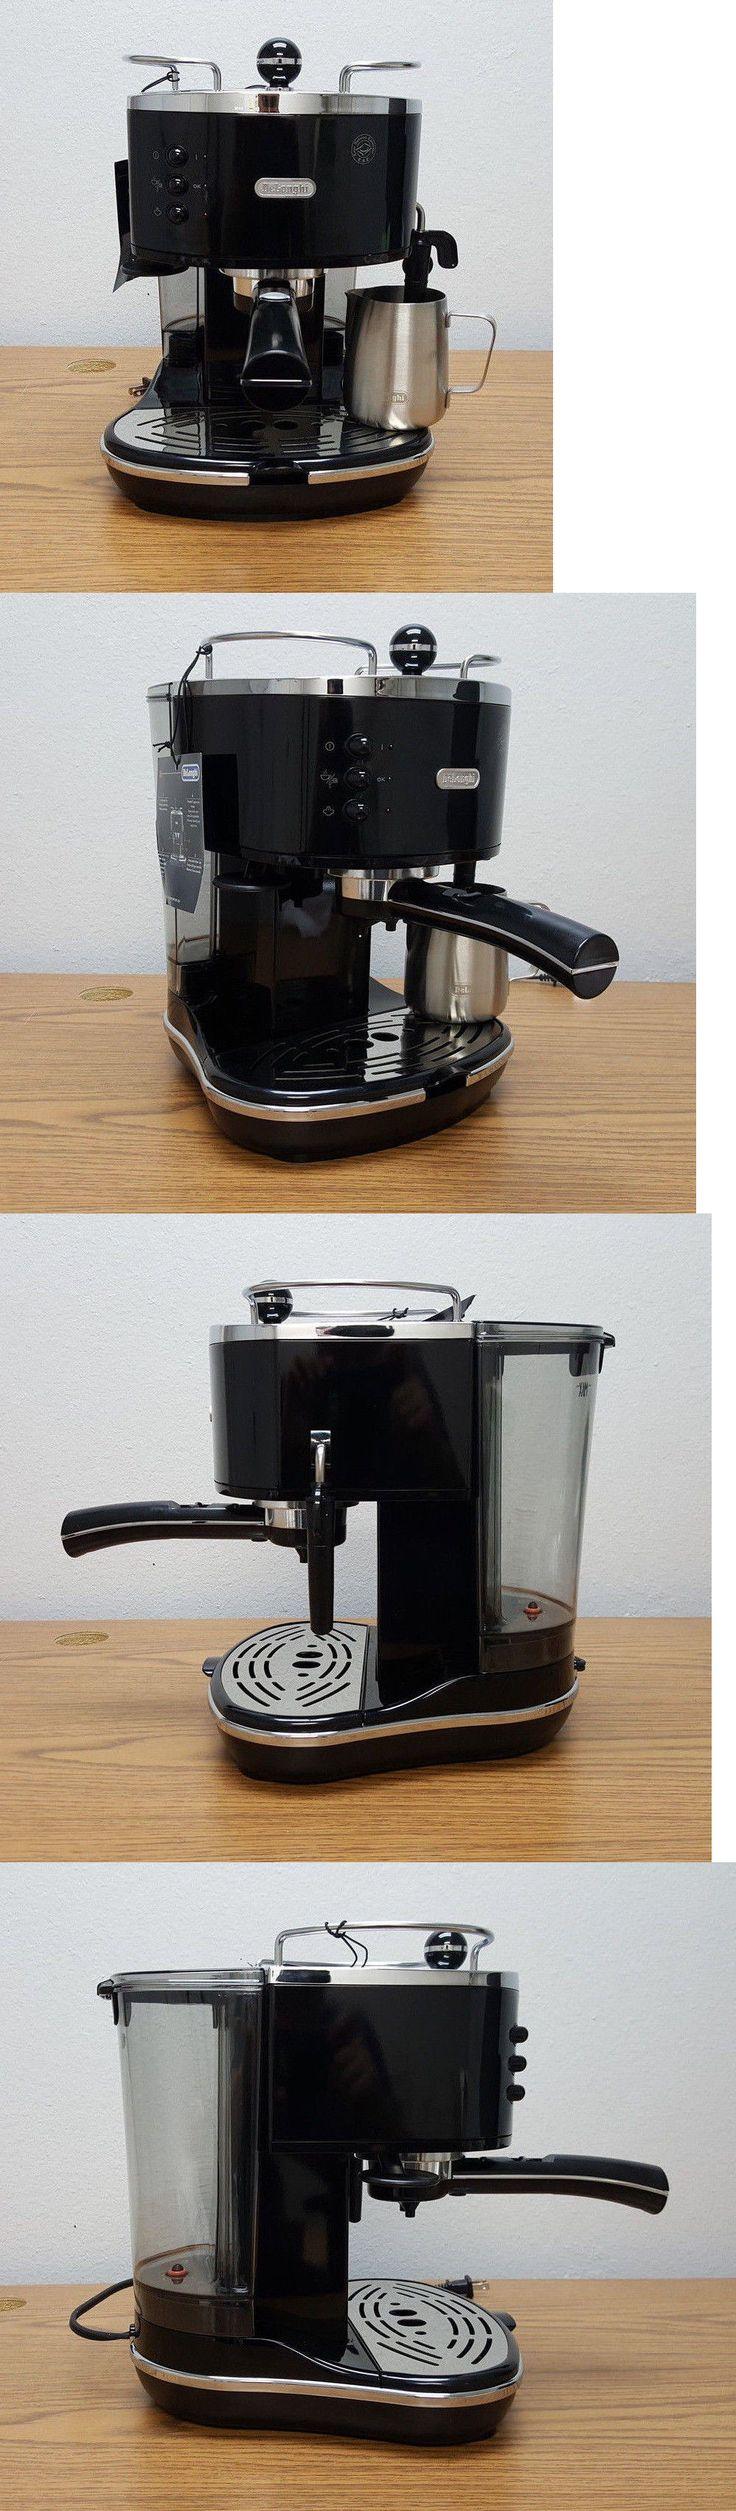 Espresso Machines 38252: Delonghi Eco310bk 15 Bar Pump Espresso Cappuccino Latte Machine, Black -> BUY IT NOW ONLY: $84.99 on eBay!